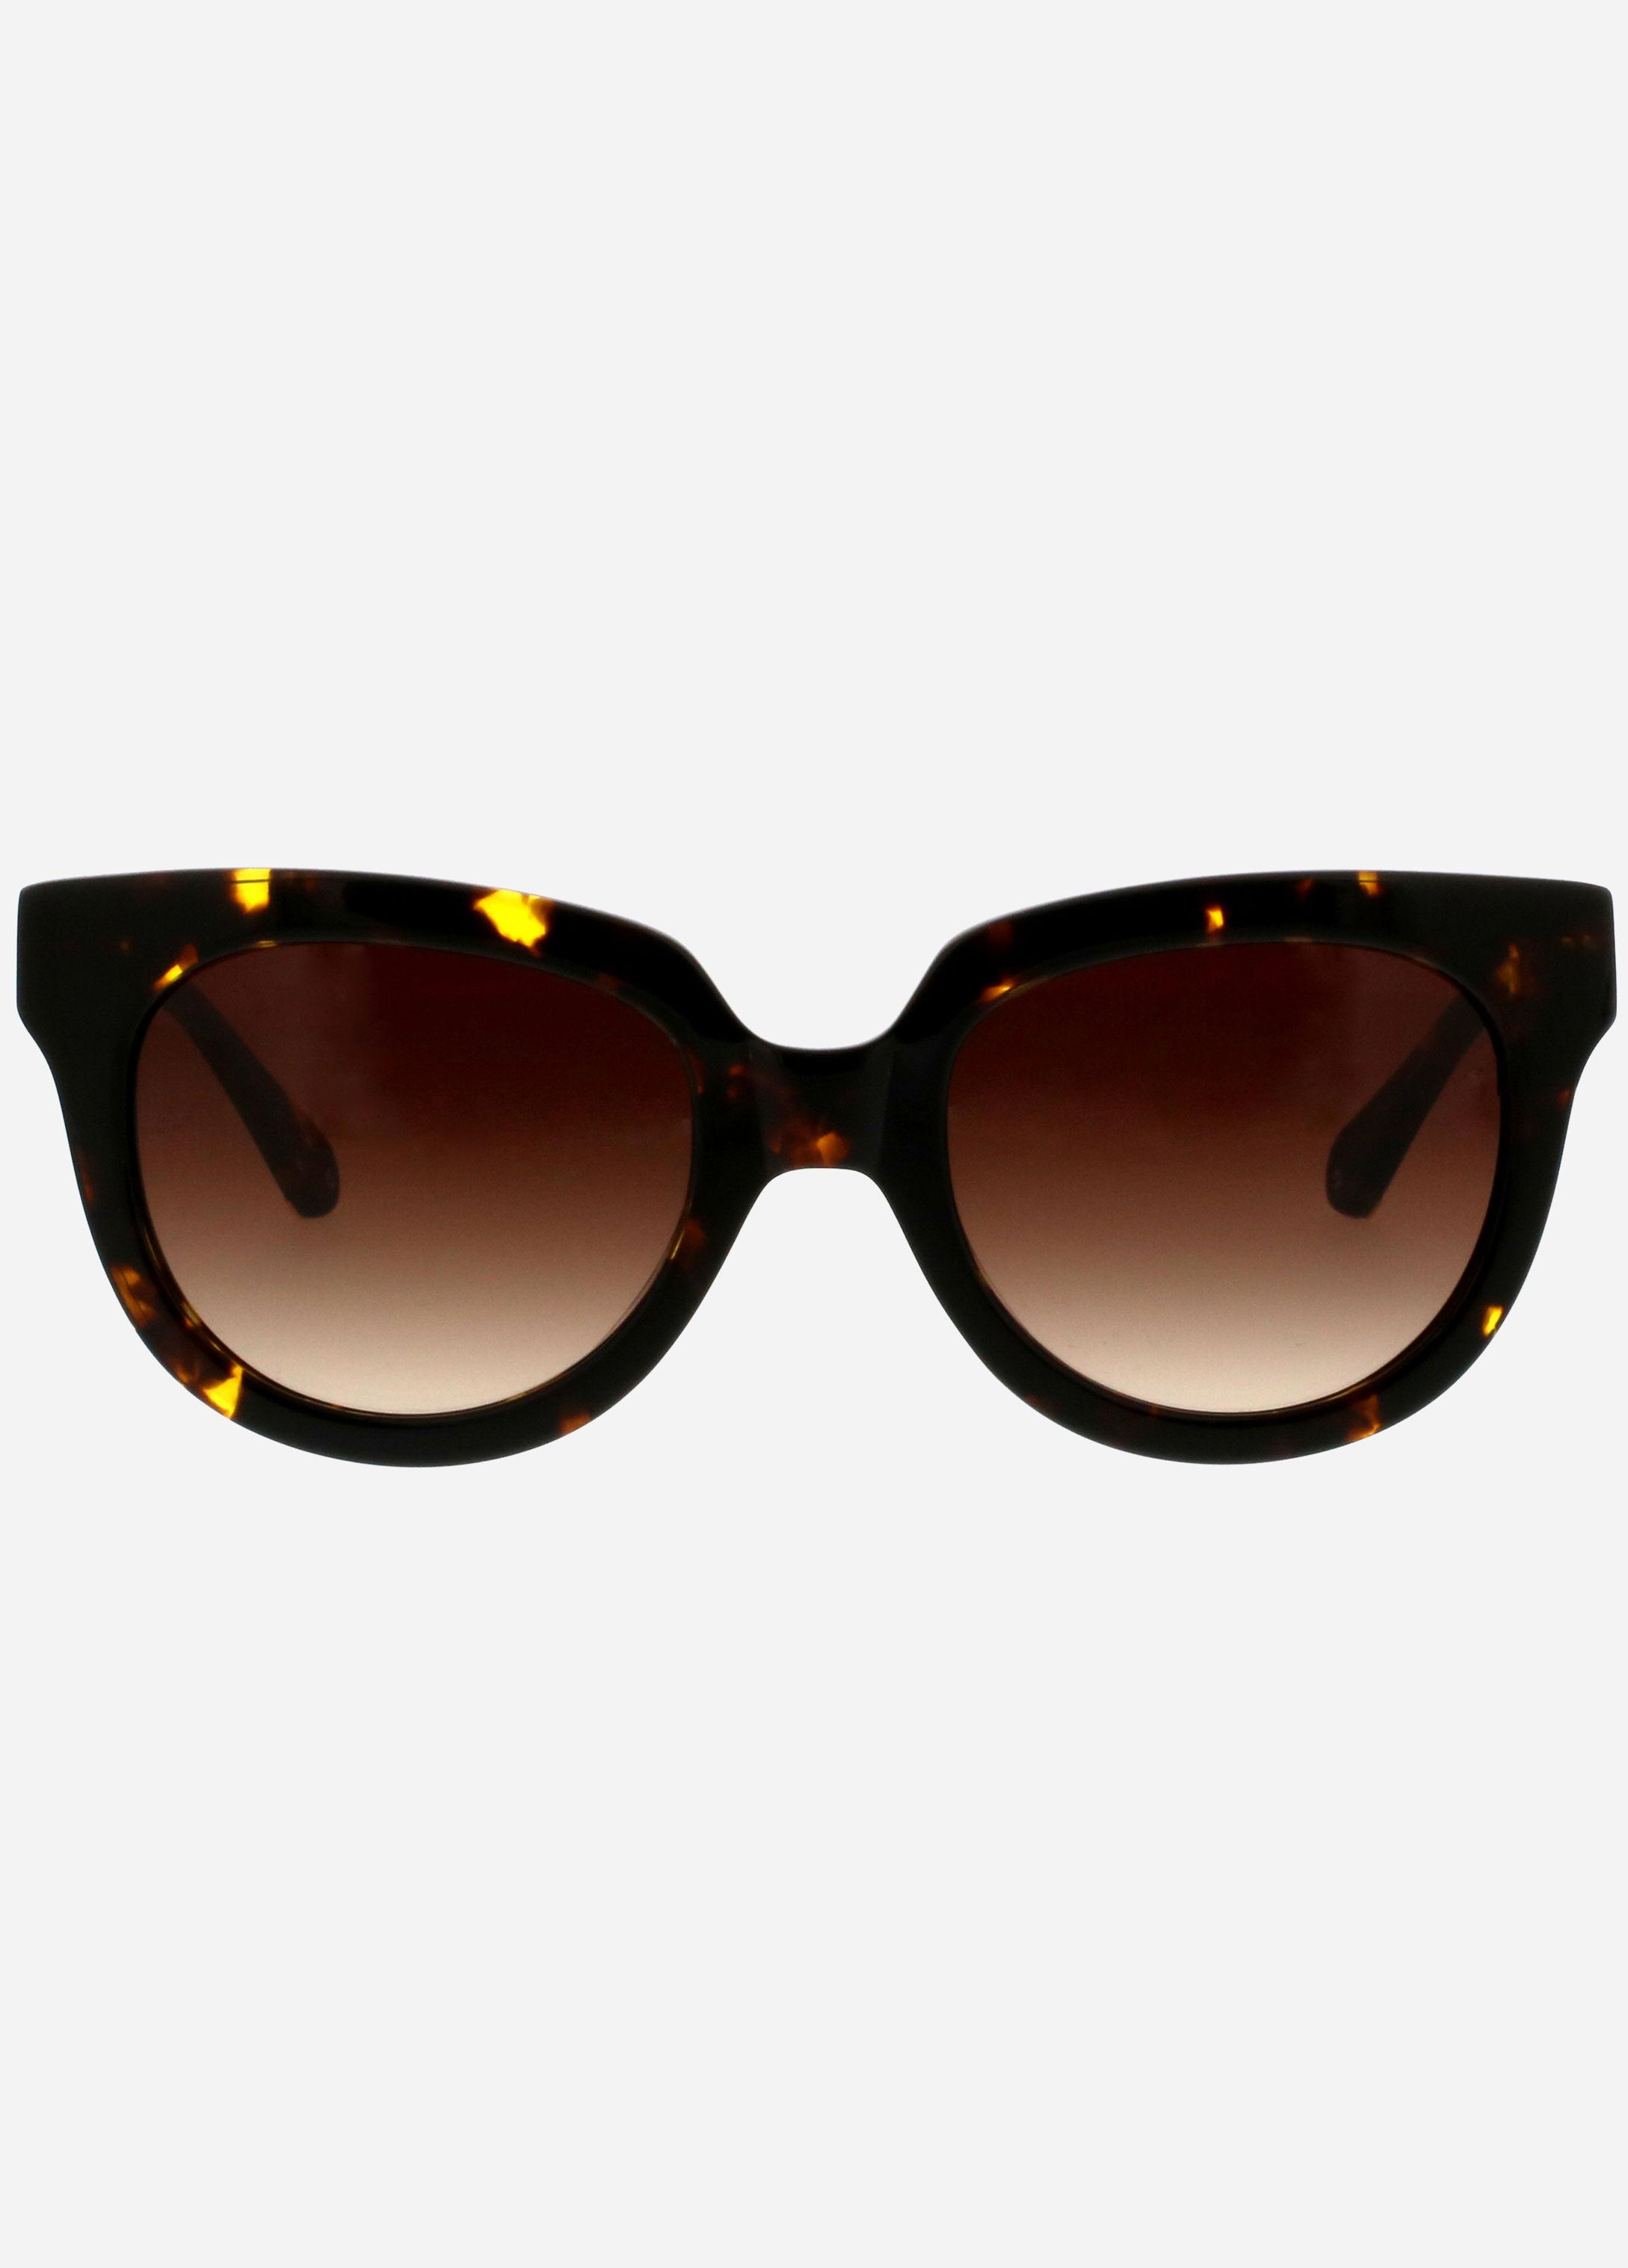 15726fc8905c4 Ashley Stewart Catherine Malandrino Modern Sunglasses in Brown - Lyst